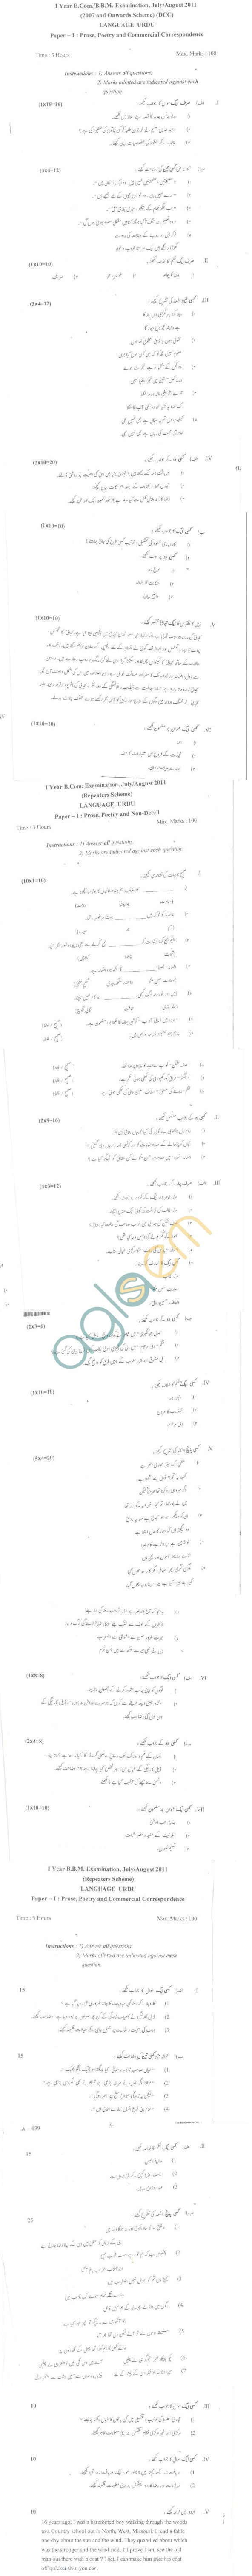 Bangalore University Question Paper July/August 2011 I Year B.Com./BBM Examination - Urdu